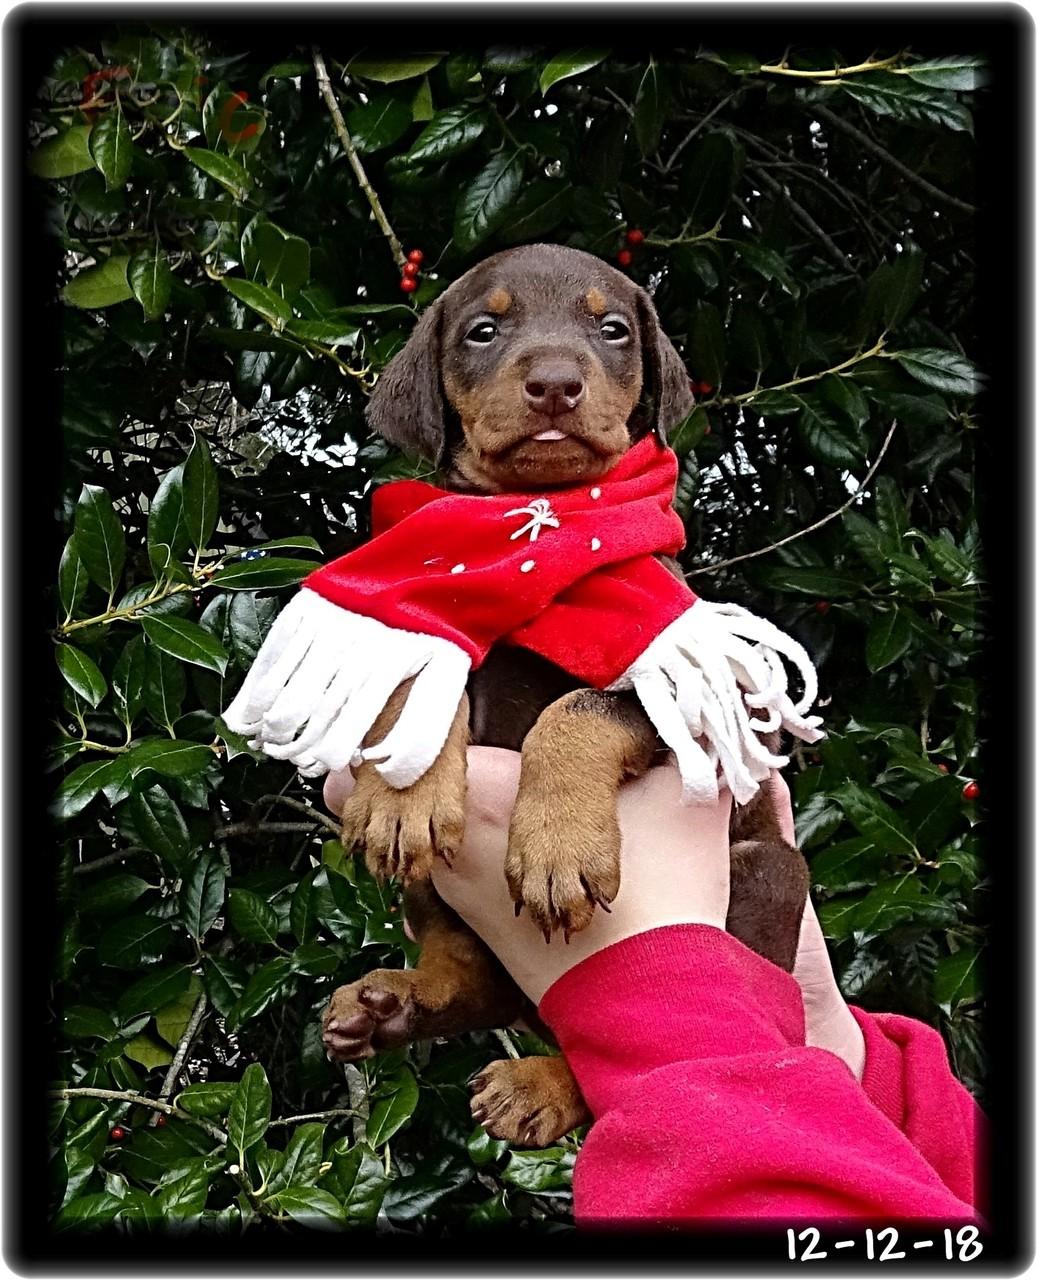 Axel...Delilah & Kodiak pup born 11-12-18 - Available